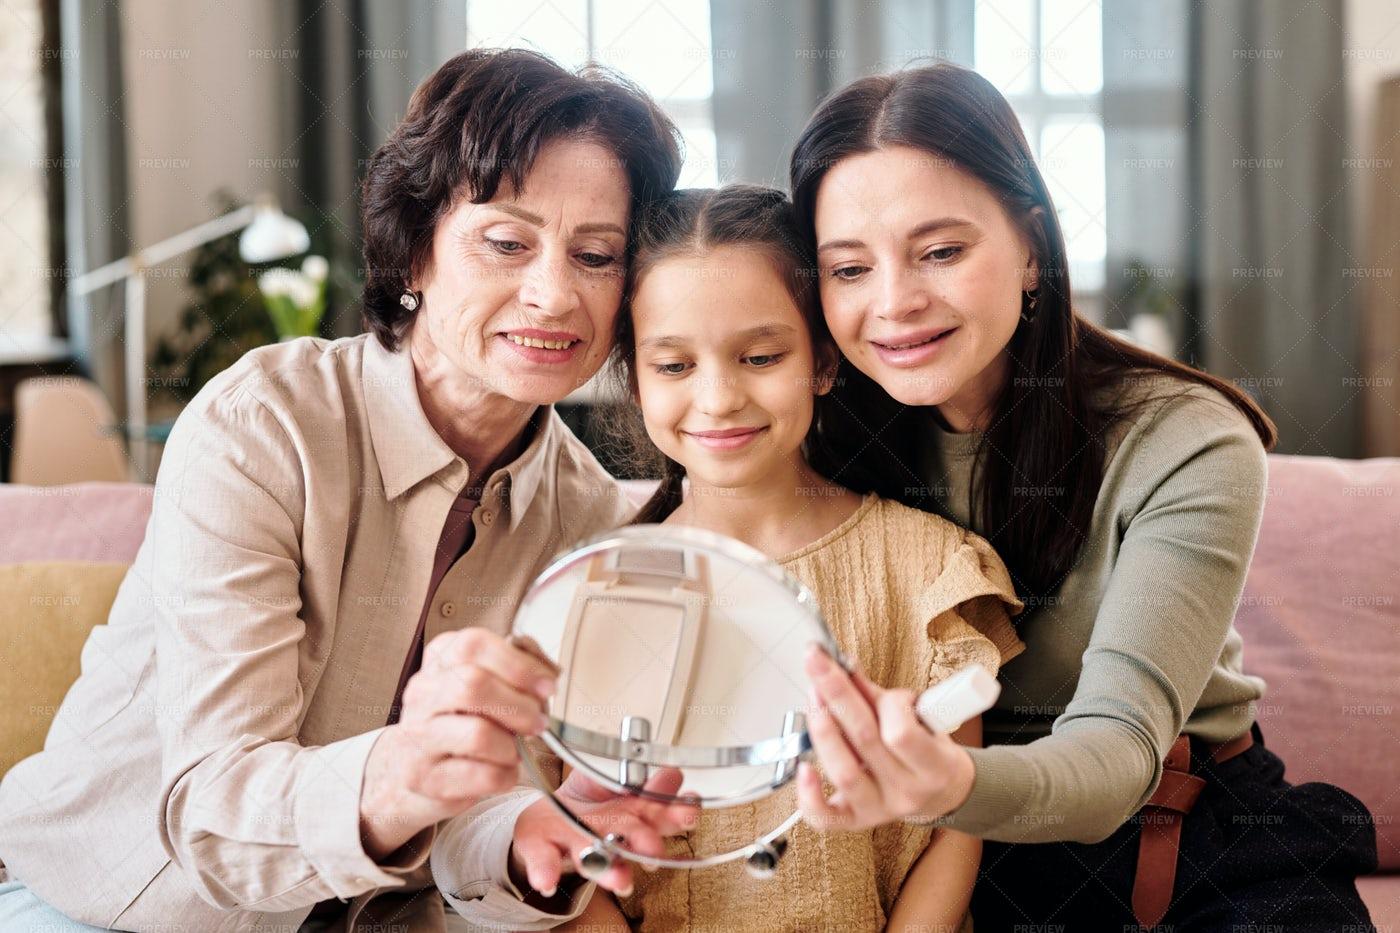 Women Looking At Mirror: Stock Photos